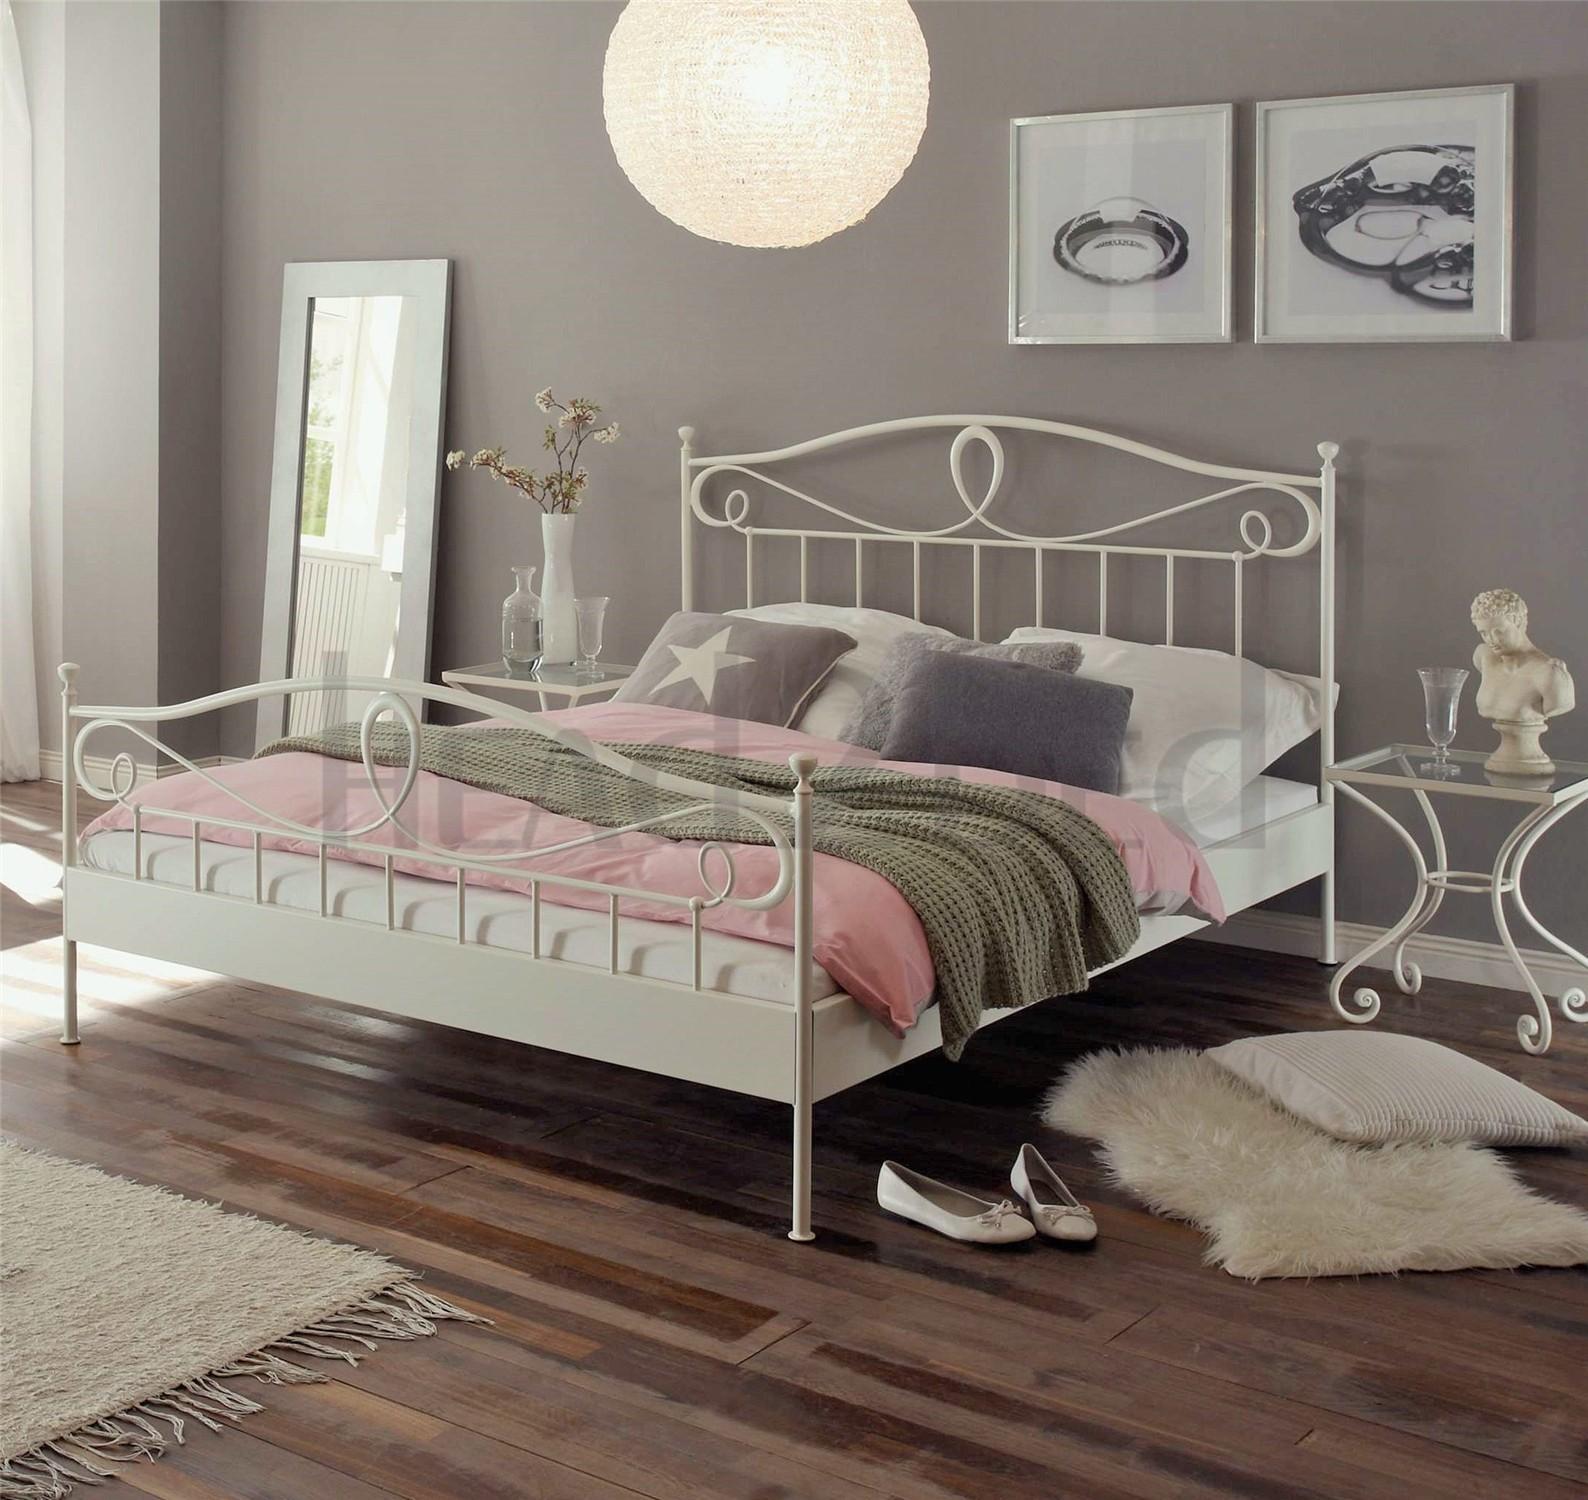 Design Wrought Iron Bed hasena romantic lurano solid wrought iron bed head2bed uk bed